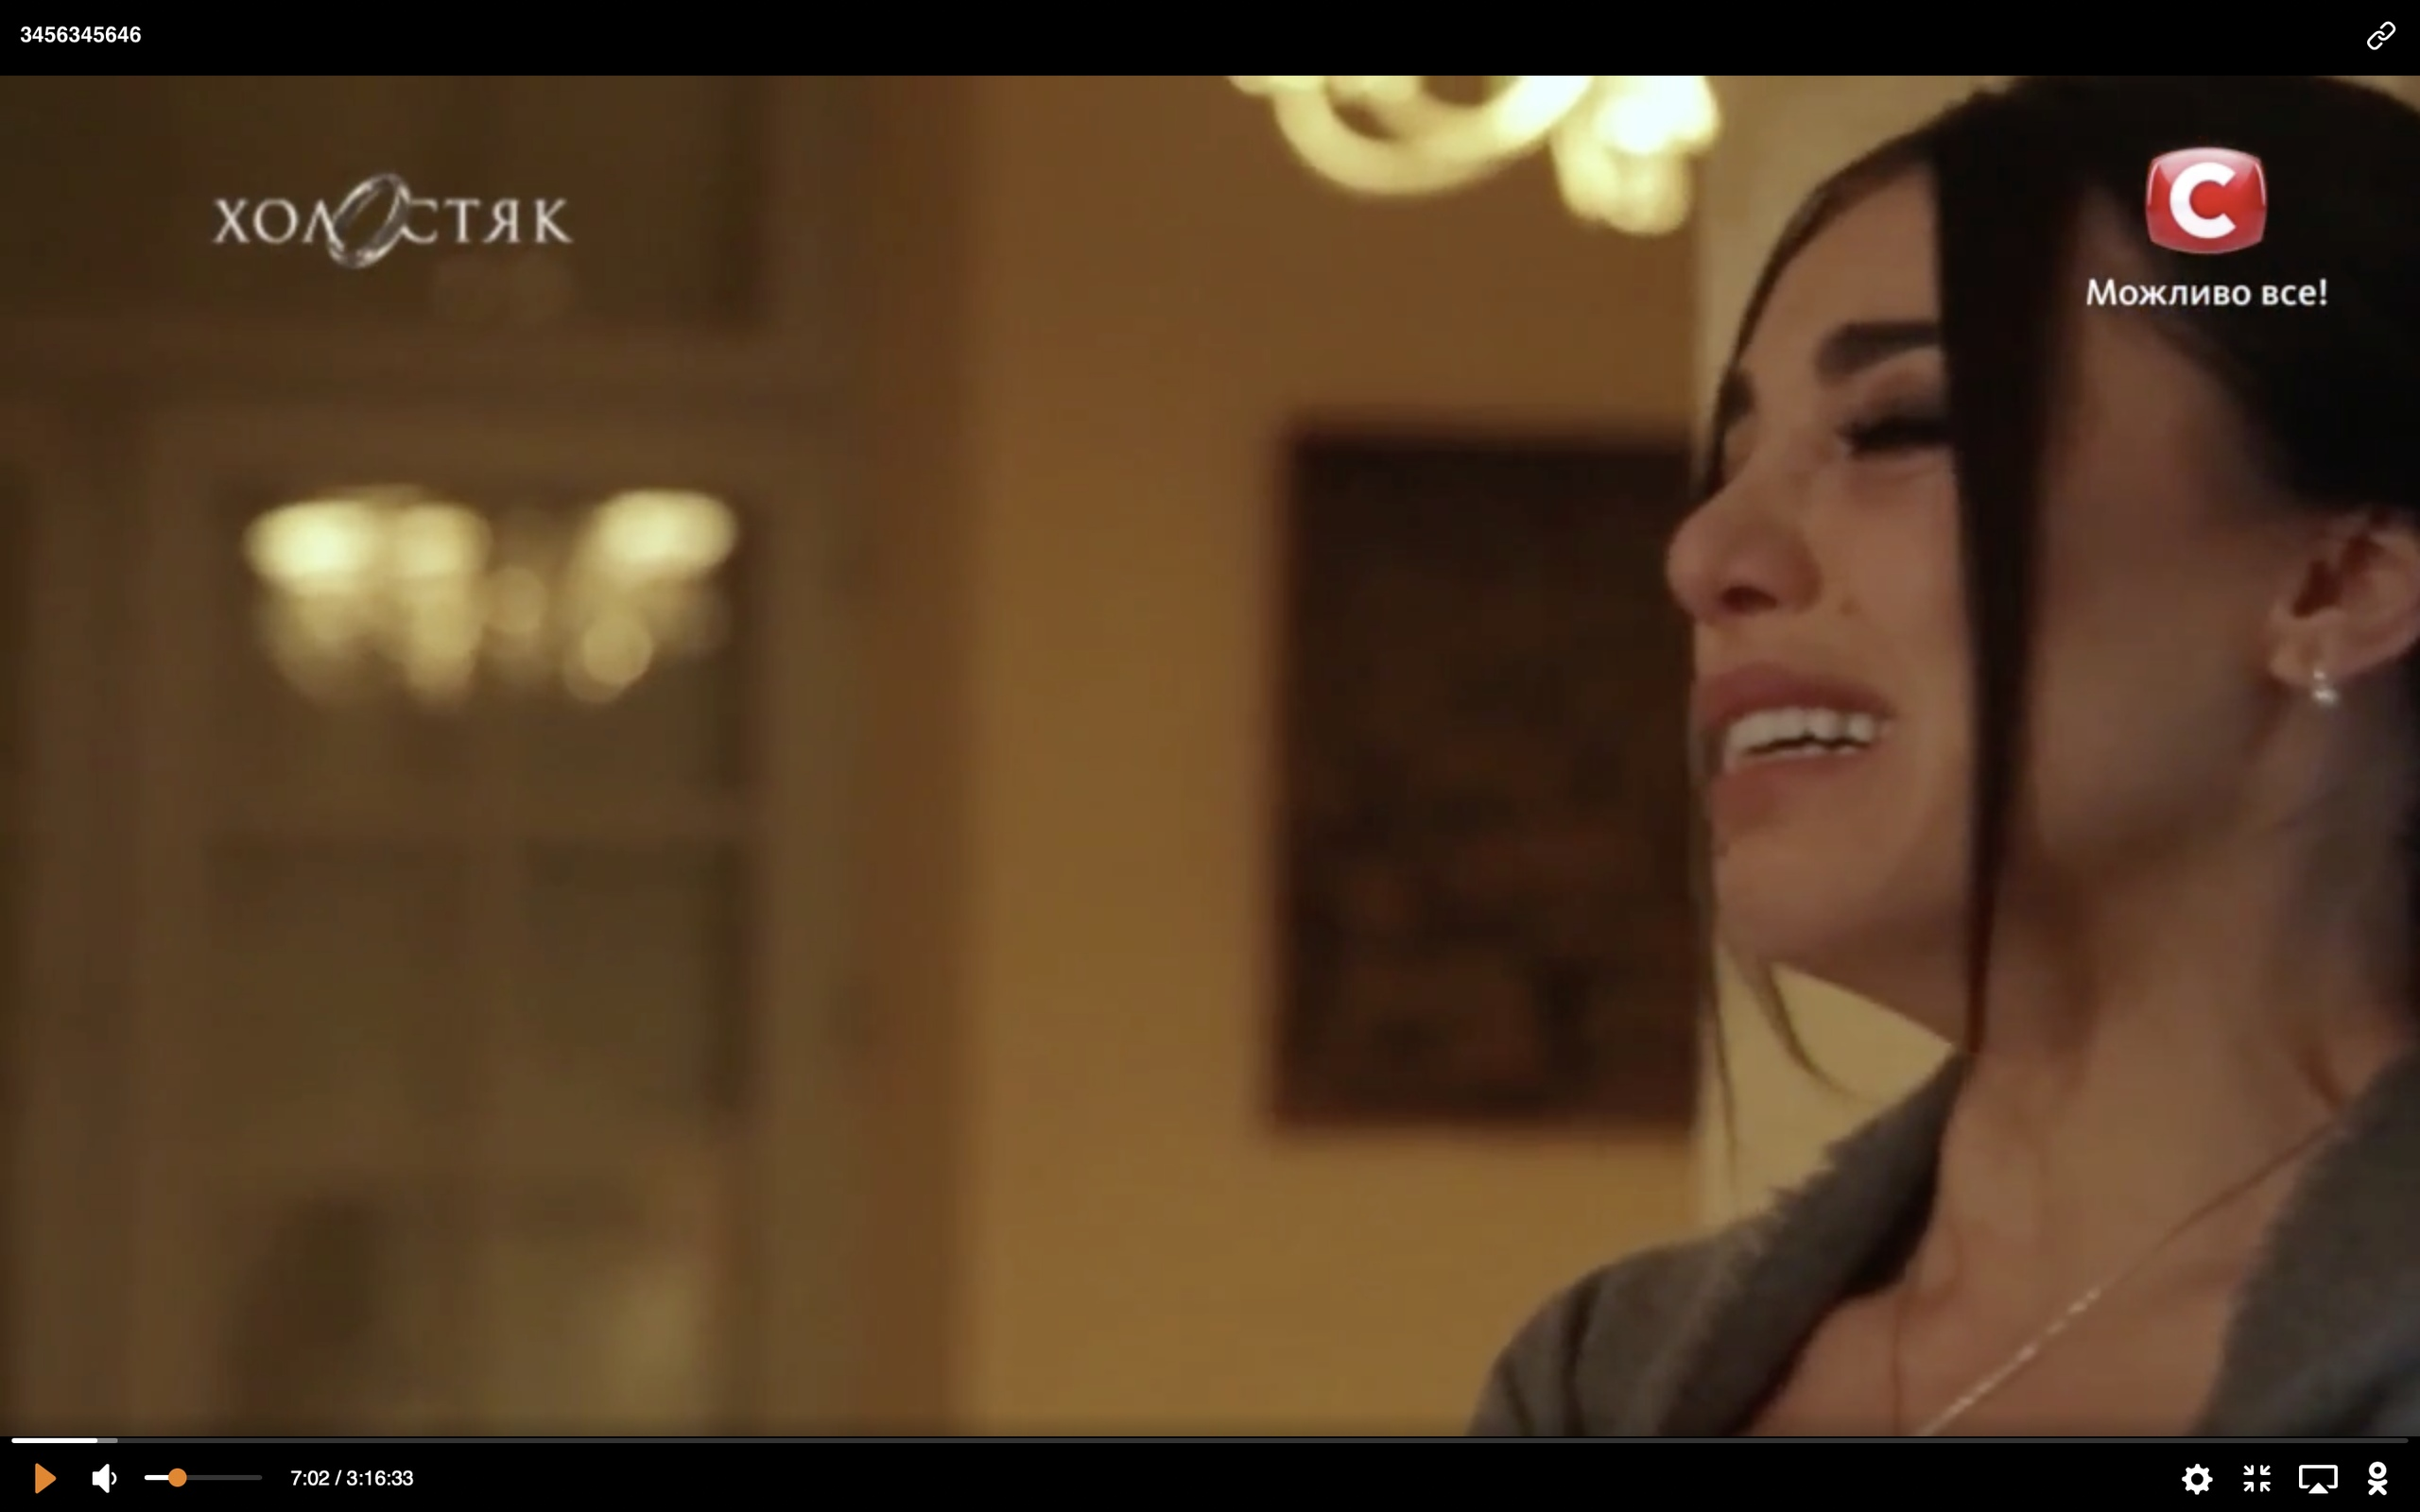 Bachelor Ukraine - Season 9 - Nikita Dobrynin - *Sleuthing Spoilers* - Page 10 8GgIU7oGou8